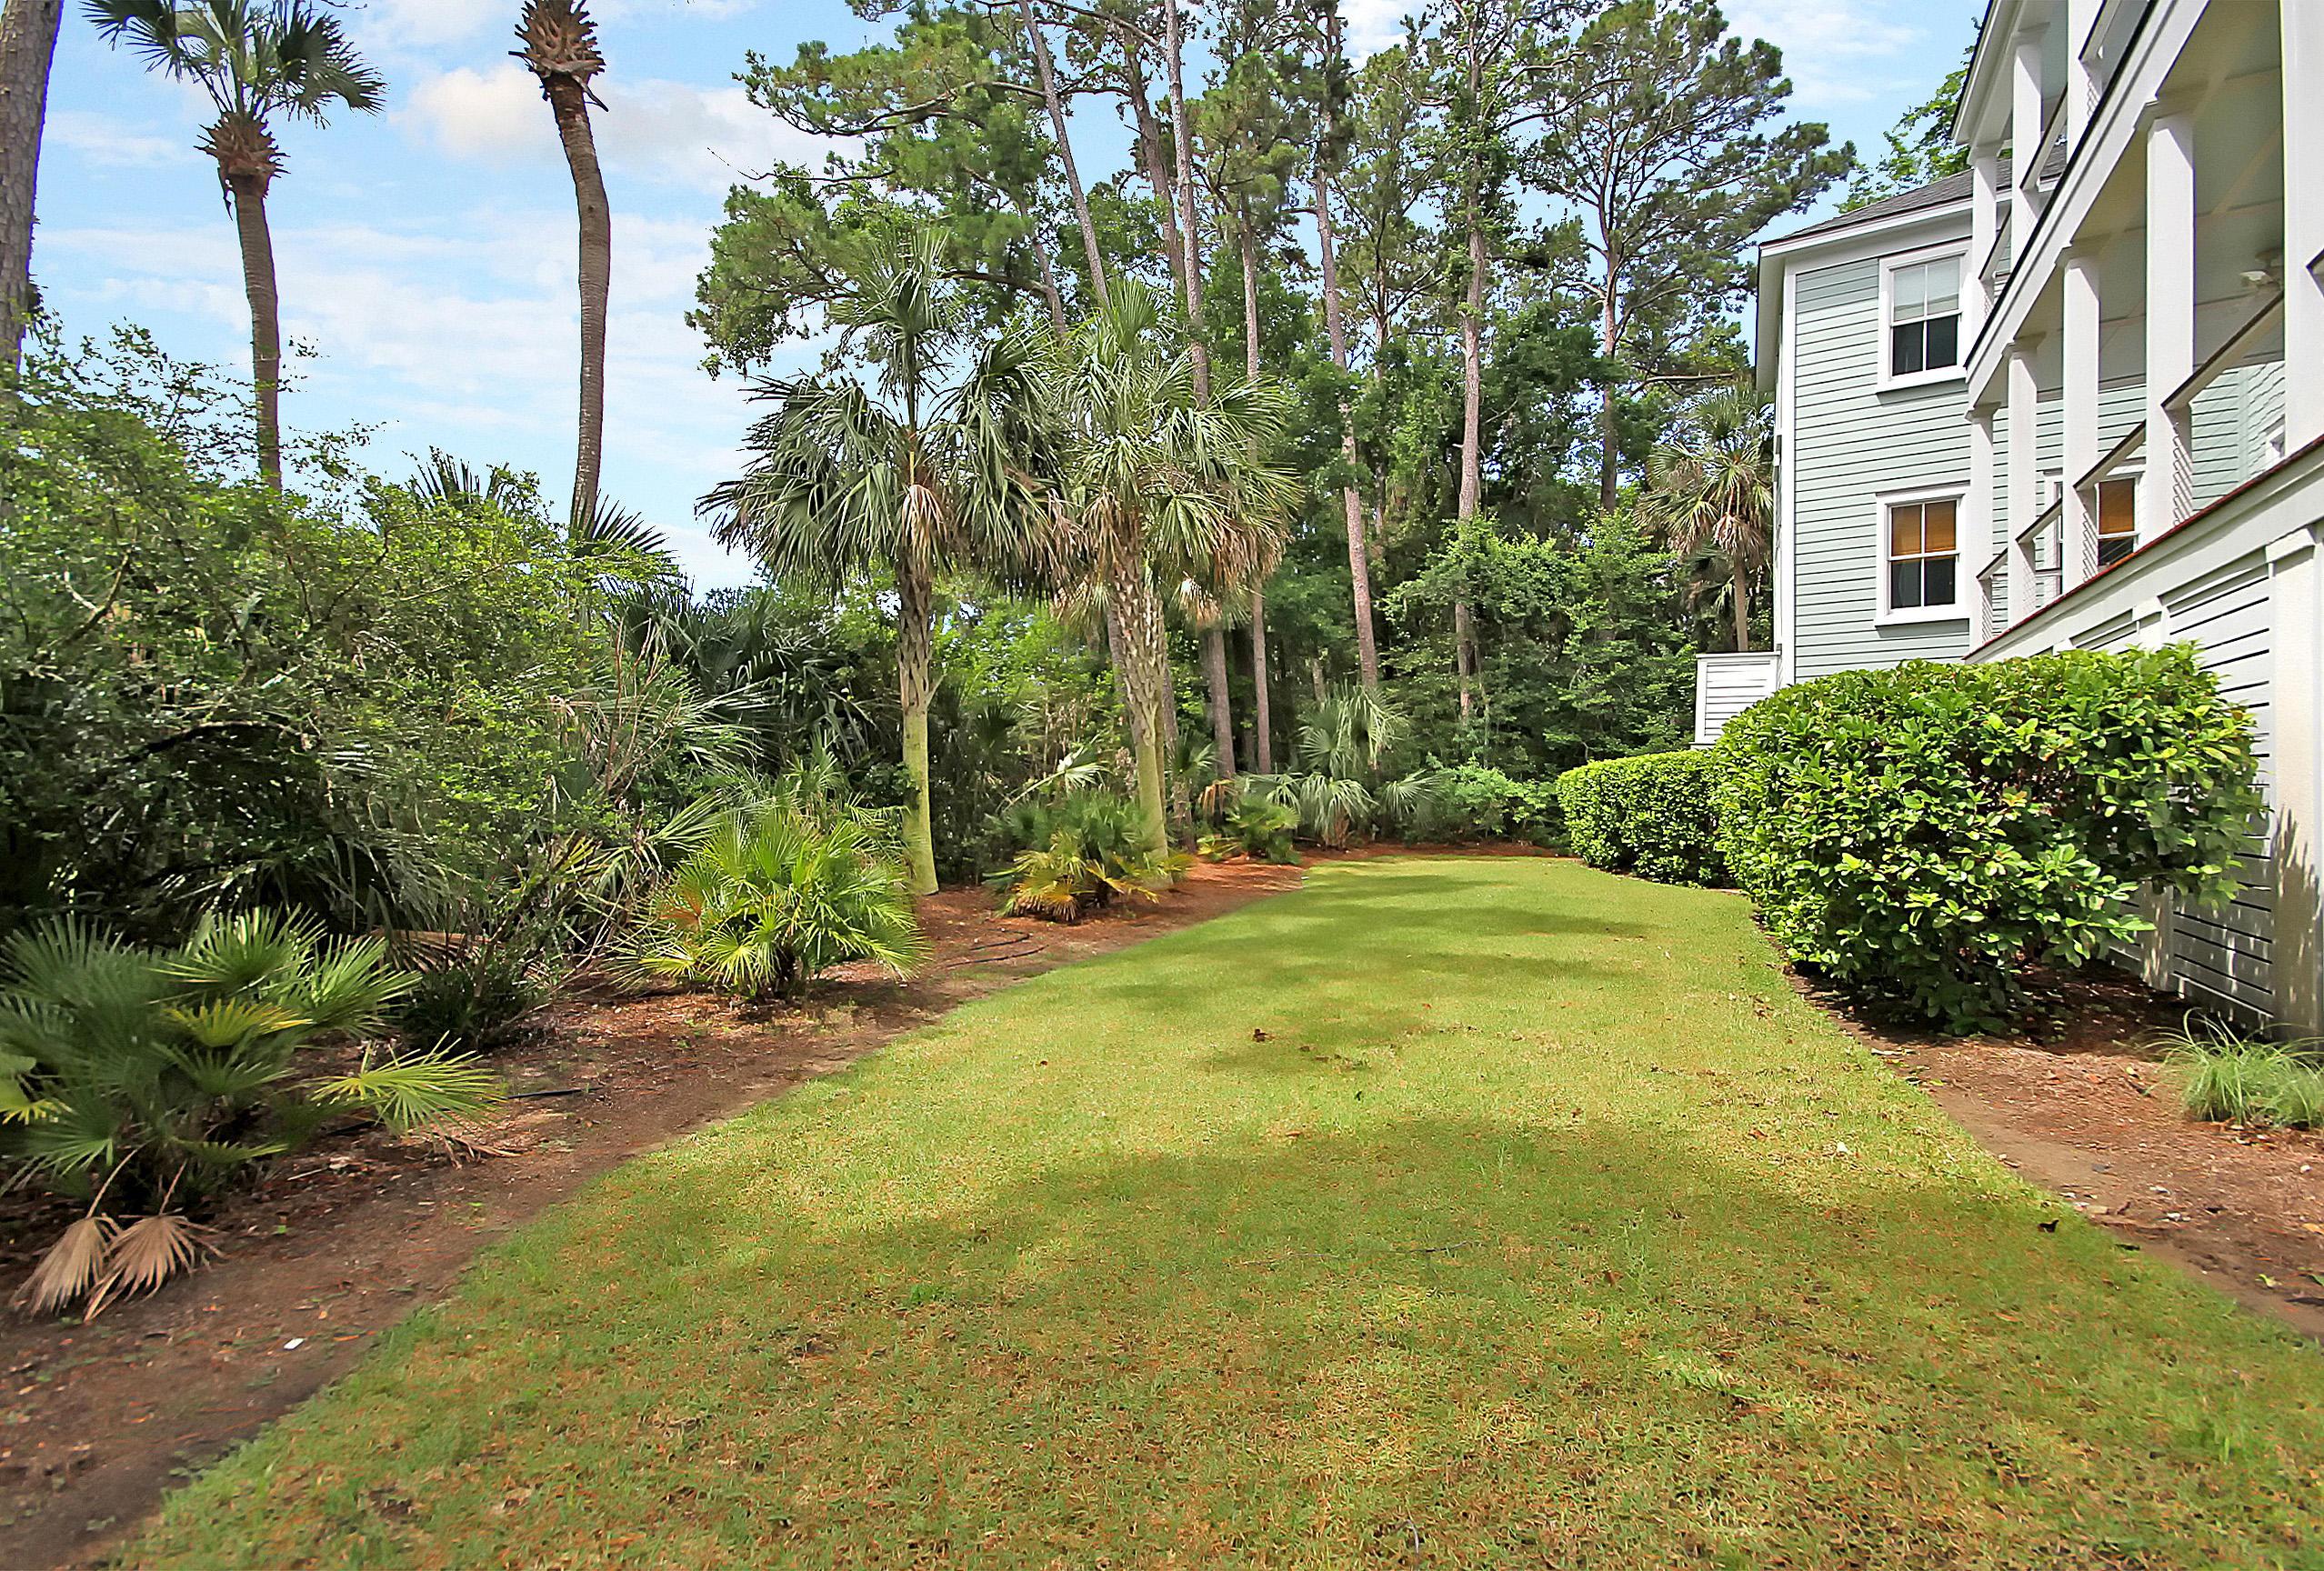 Seabrook Island Homes For Sale - 3278 Privateer Creek, Seabrook Island, SC - 15